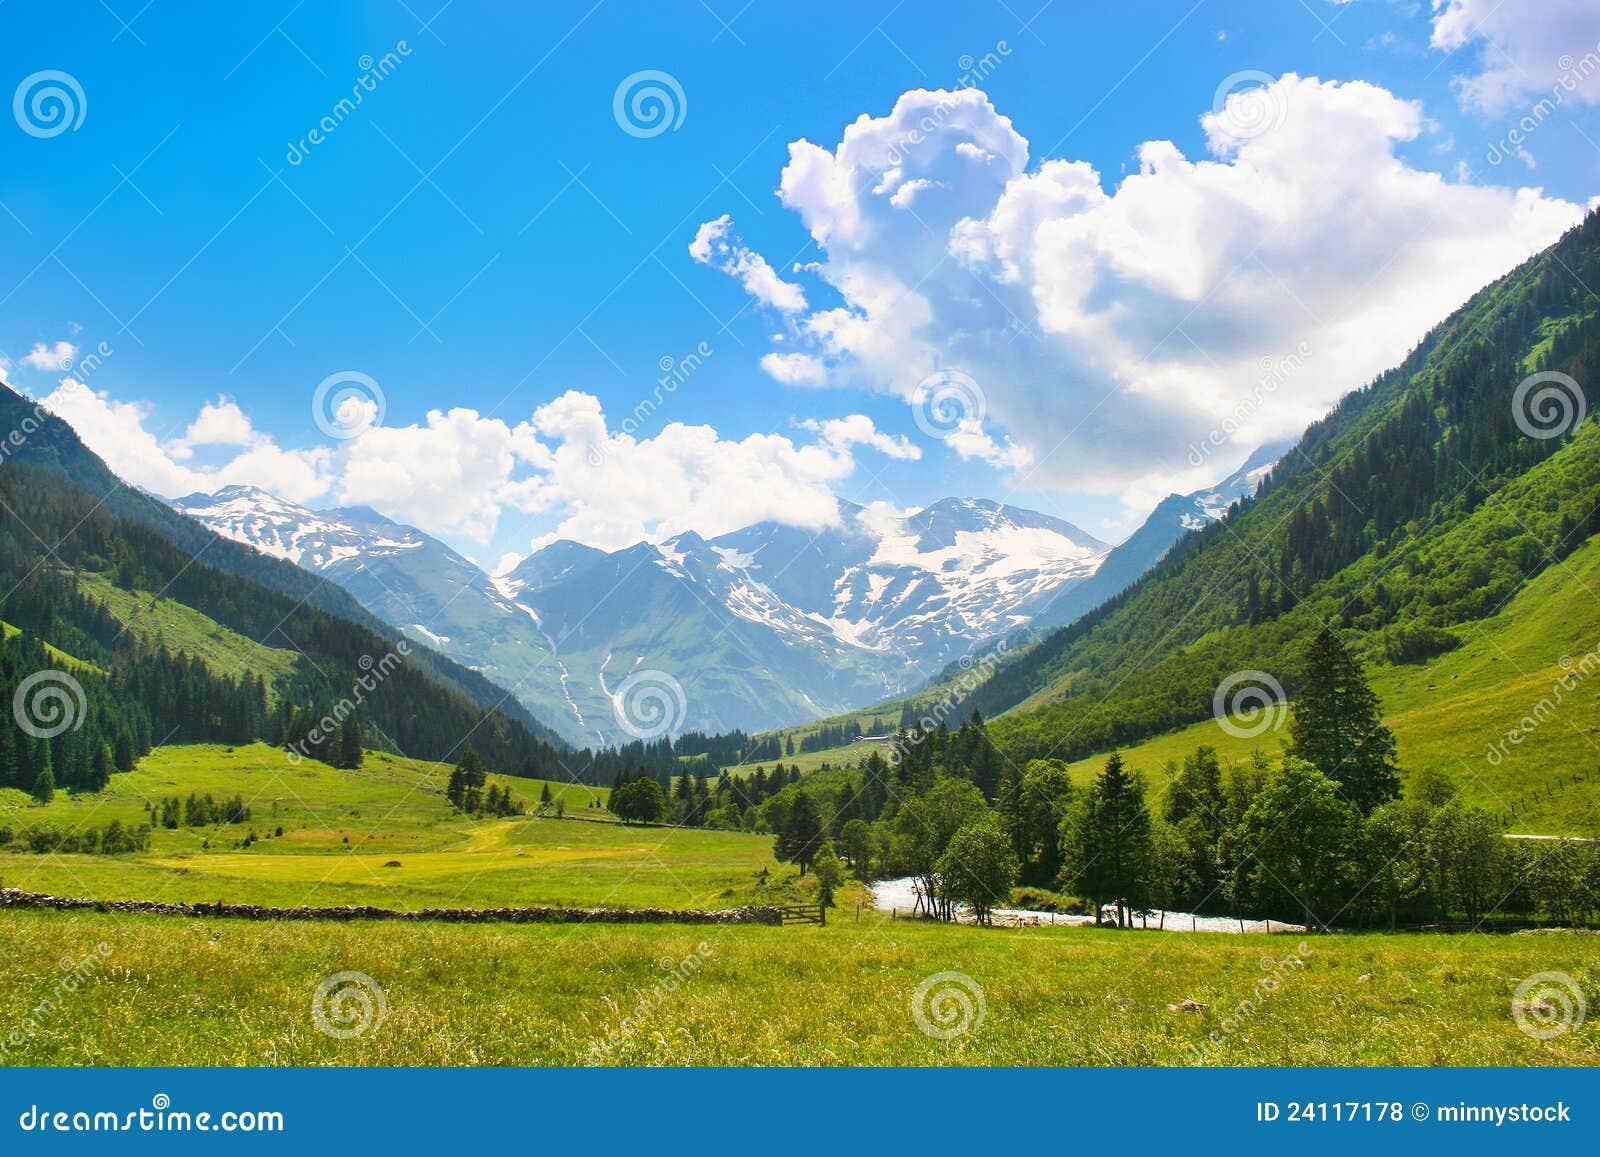 Nature Images 2mb: Romantic Summer Nature Landscape Stock Photo